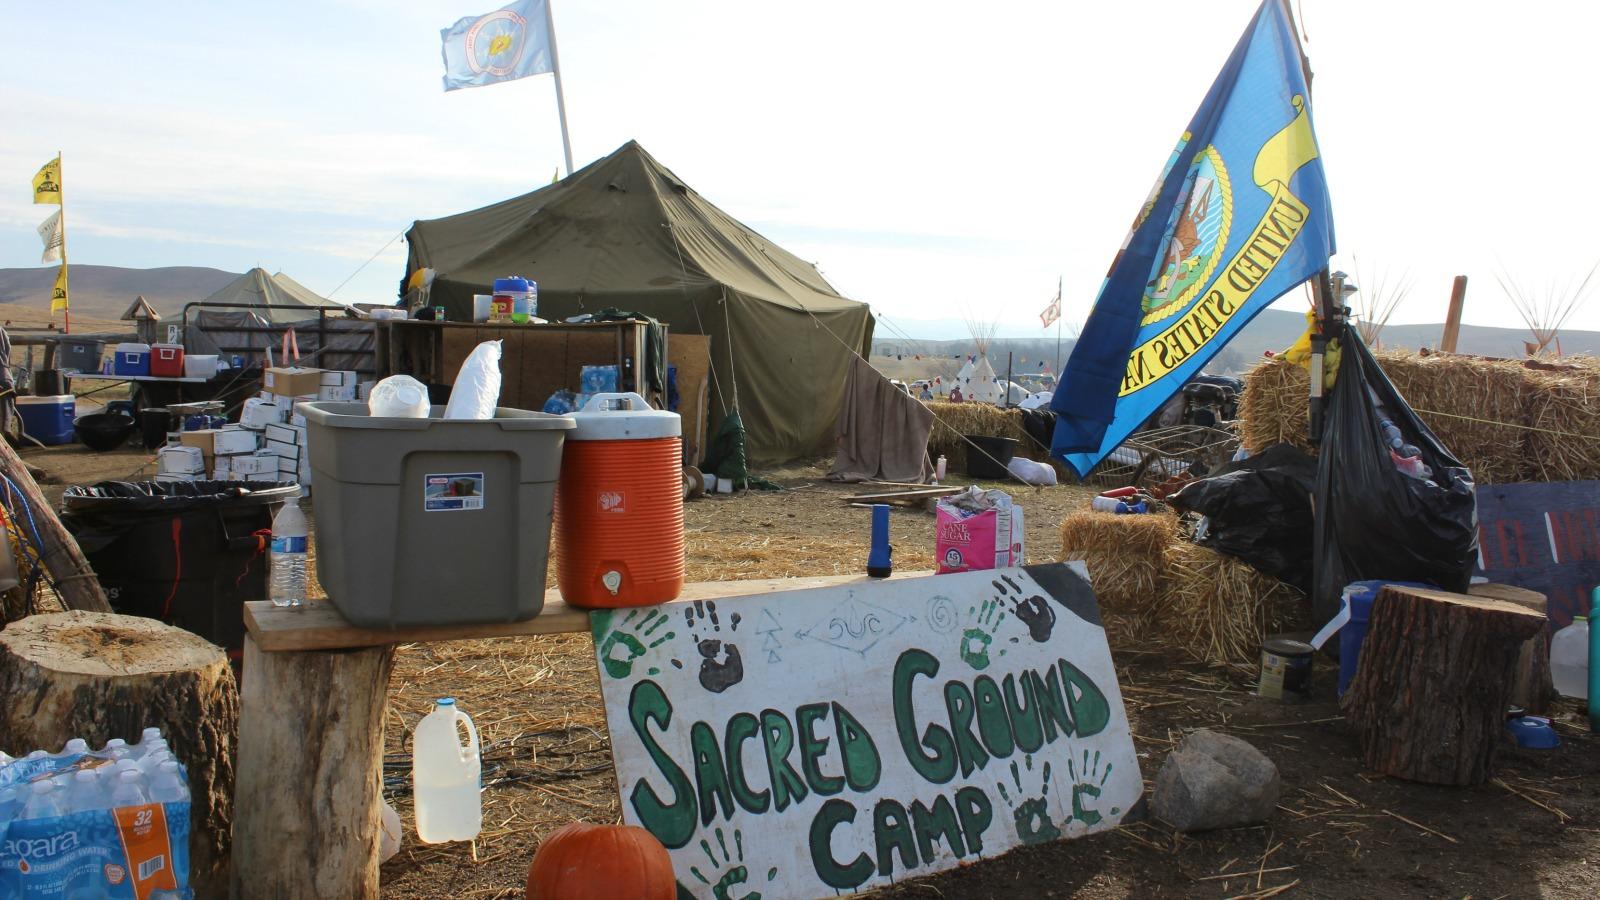 sacred-ground-camp